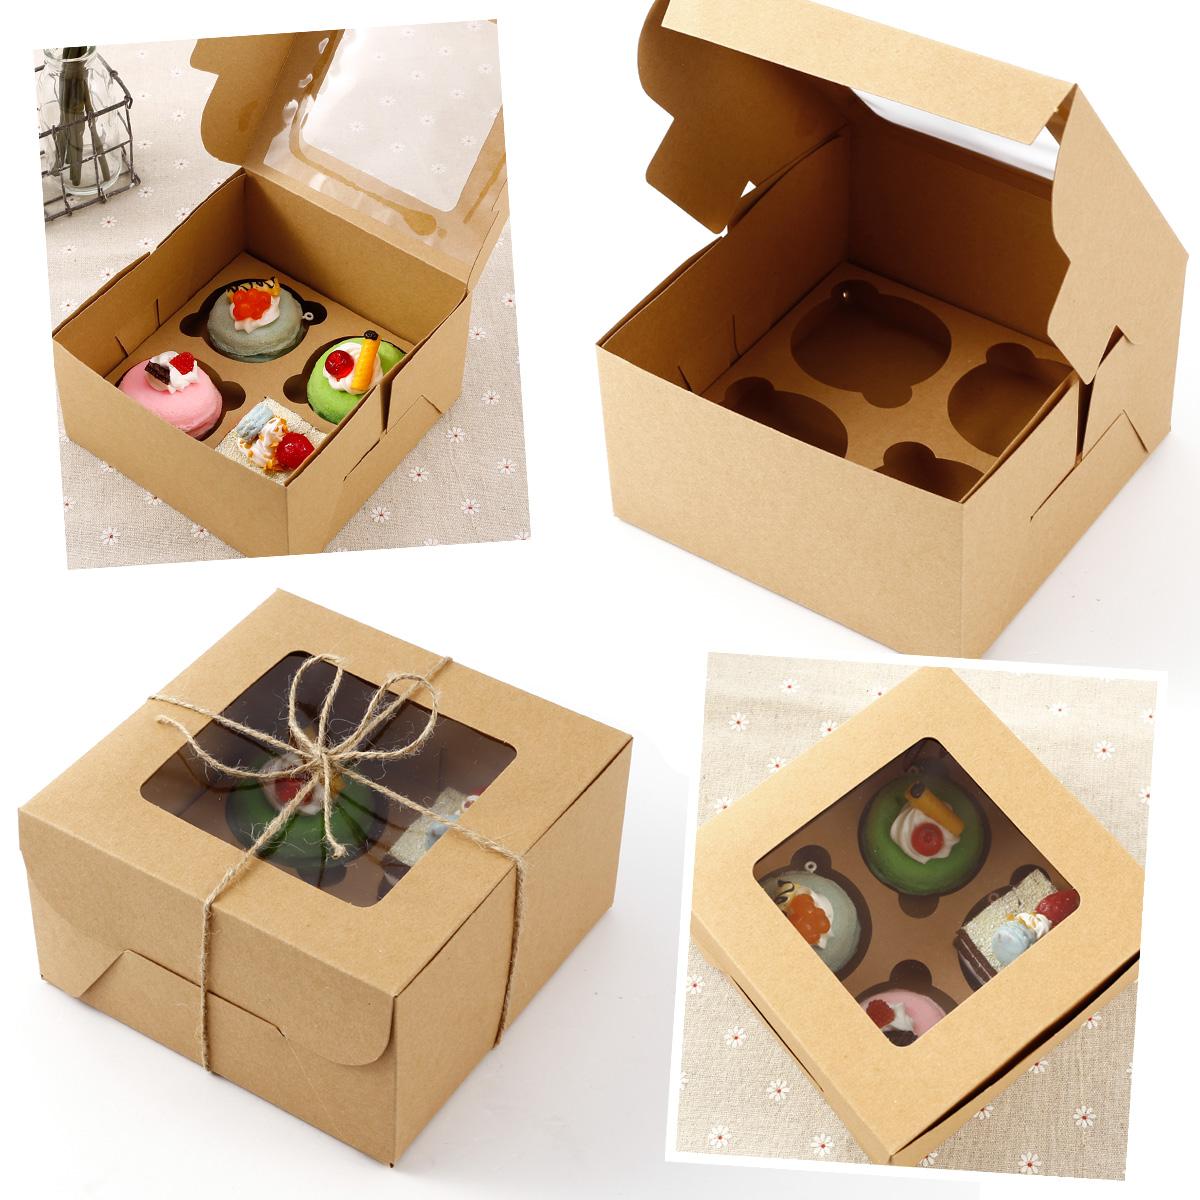 25x bo te cupcakes g teau muffin p tisserie carton kraft 4 cupcakes cadeau ebay. Black Bedroom Furniture Sets. Home Design Ideas